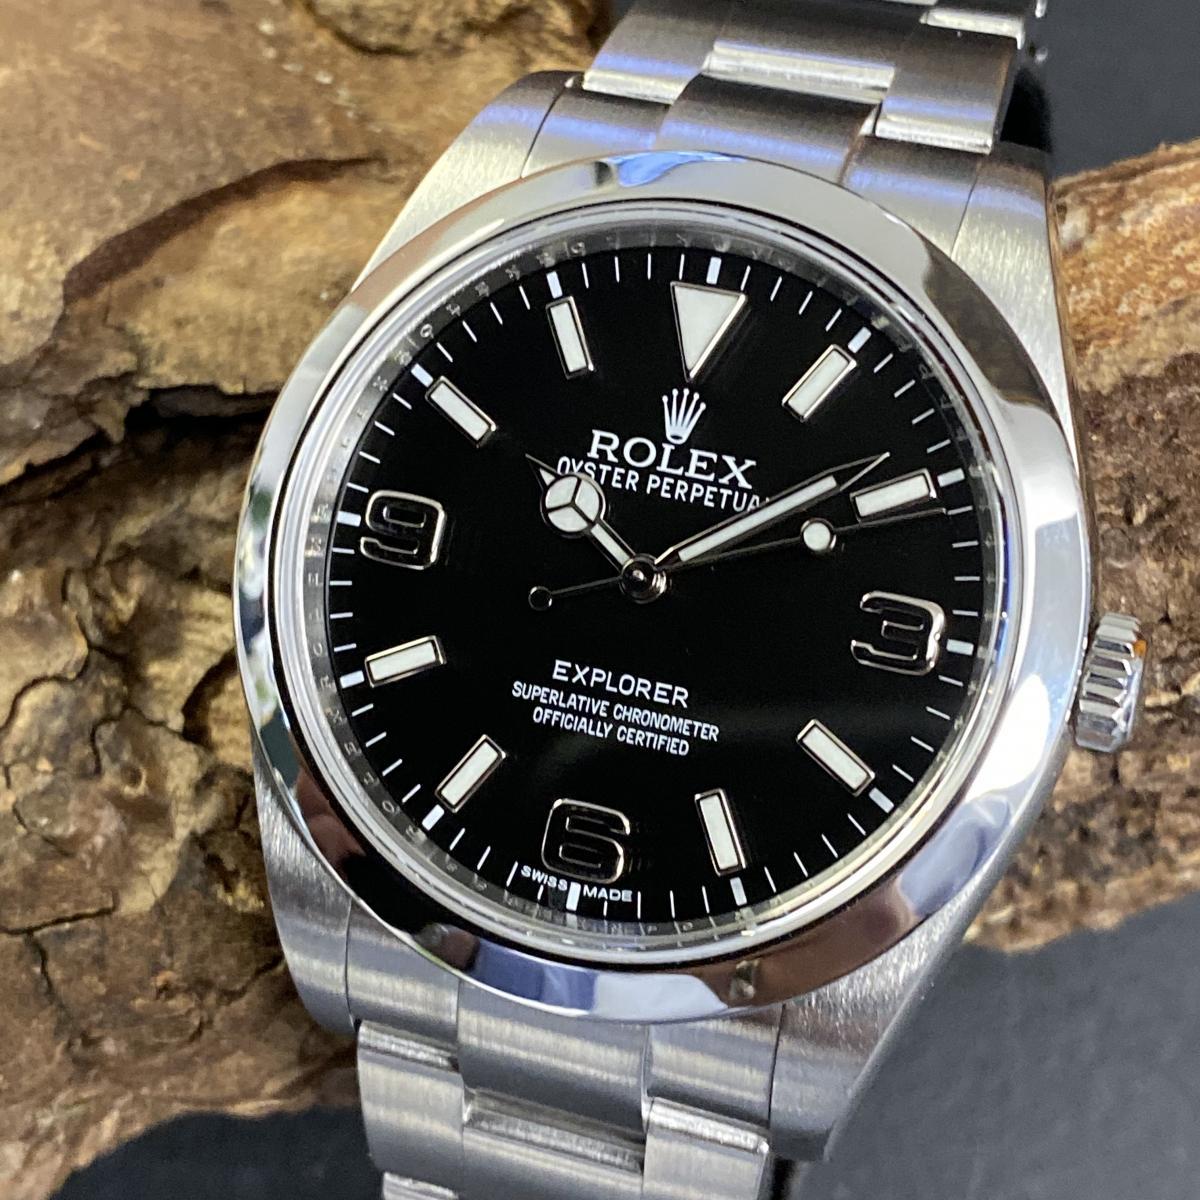 Rolex Oyster Perpetual Explorer 39 Ref. 214270